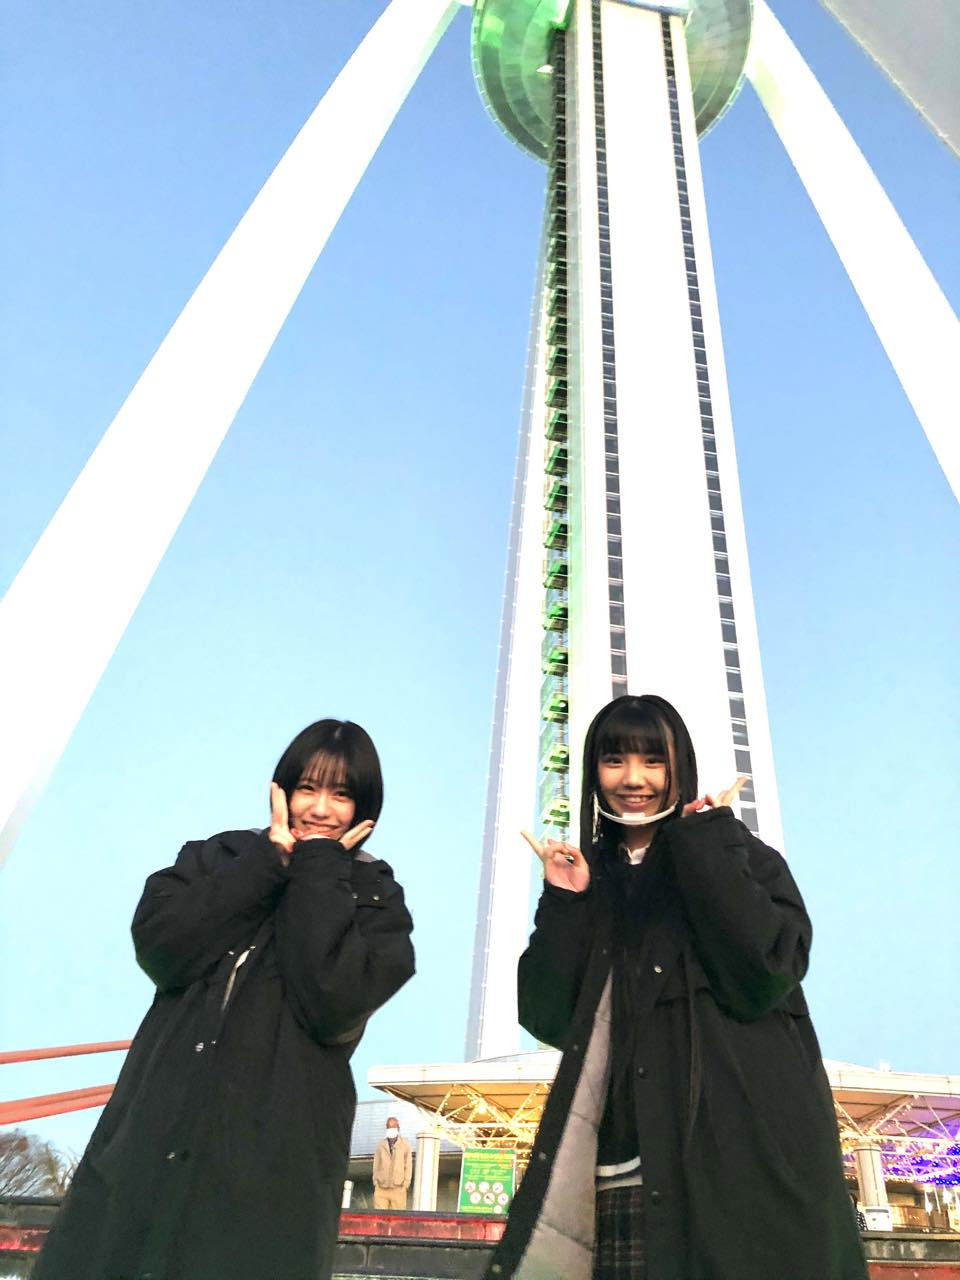 「SKE48は君と歌いたい」北川愛乃&佐藤佳穂が138タワーパークを訪れる①【東海テレビ】